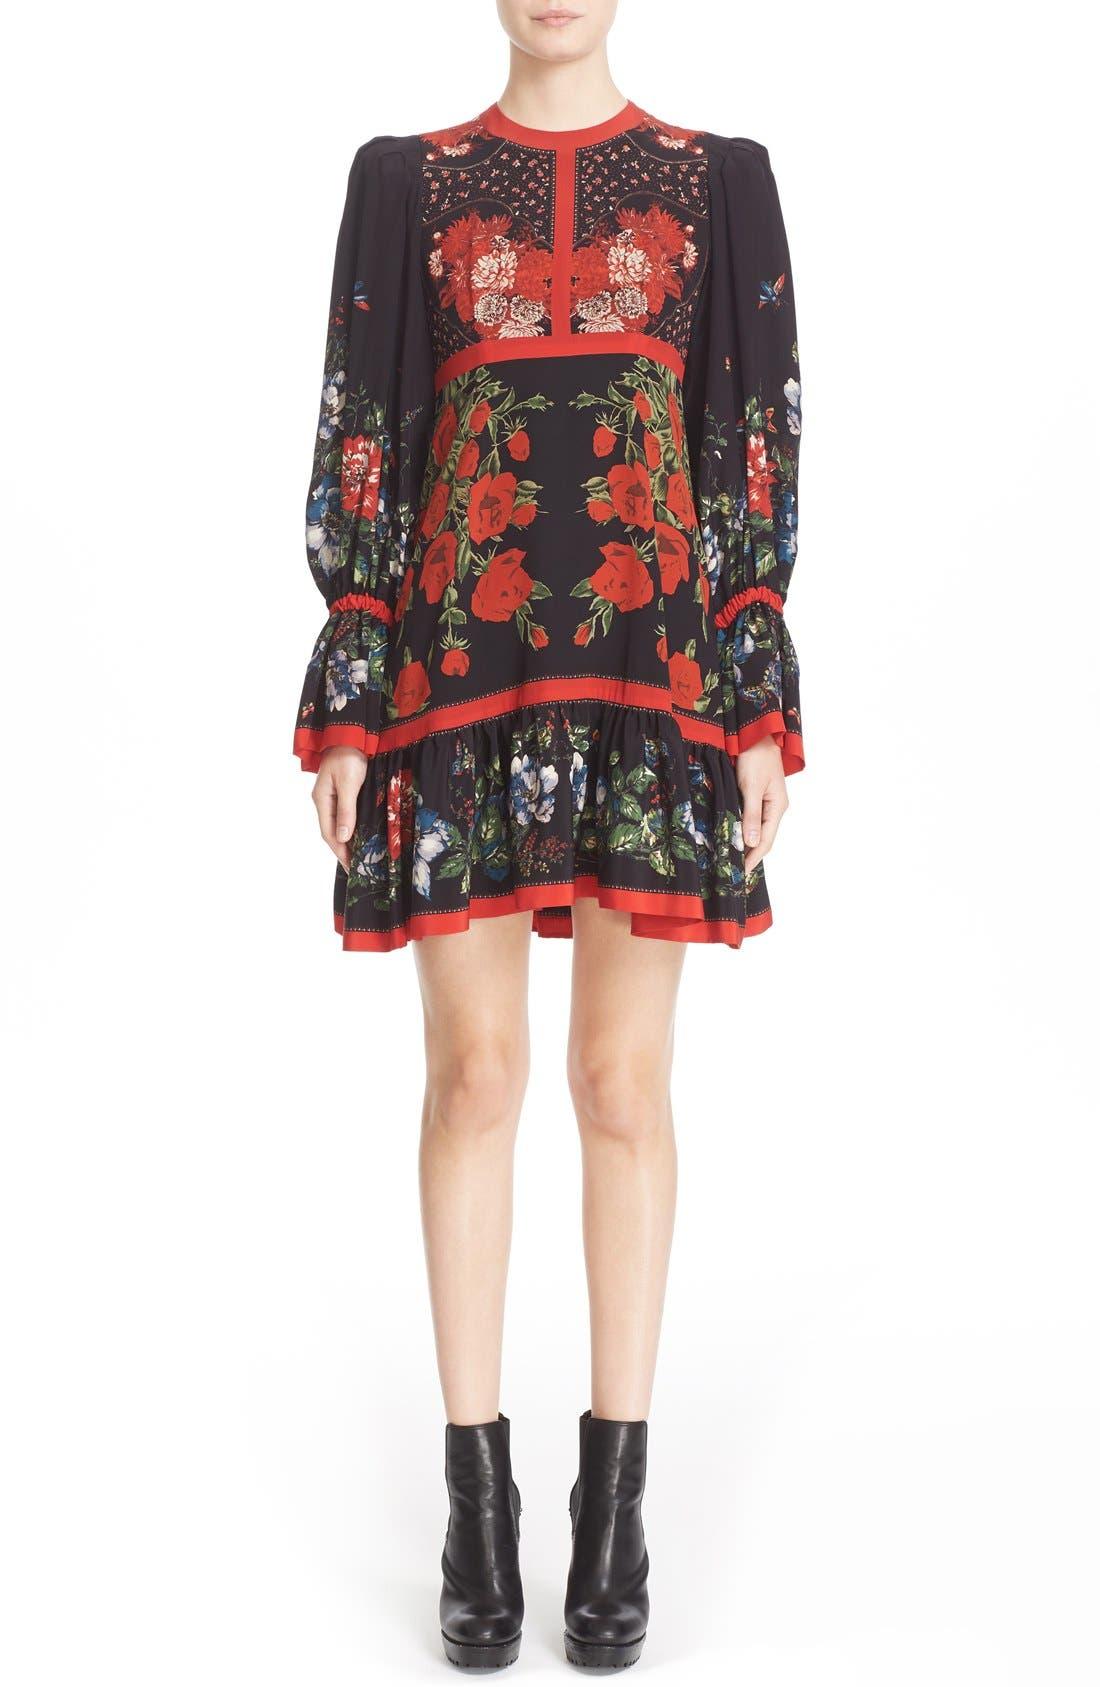 Alternate Image 1 Selected - Alexander McQueen Floral Print Silk Dress